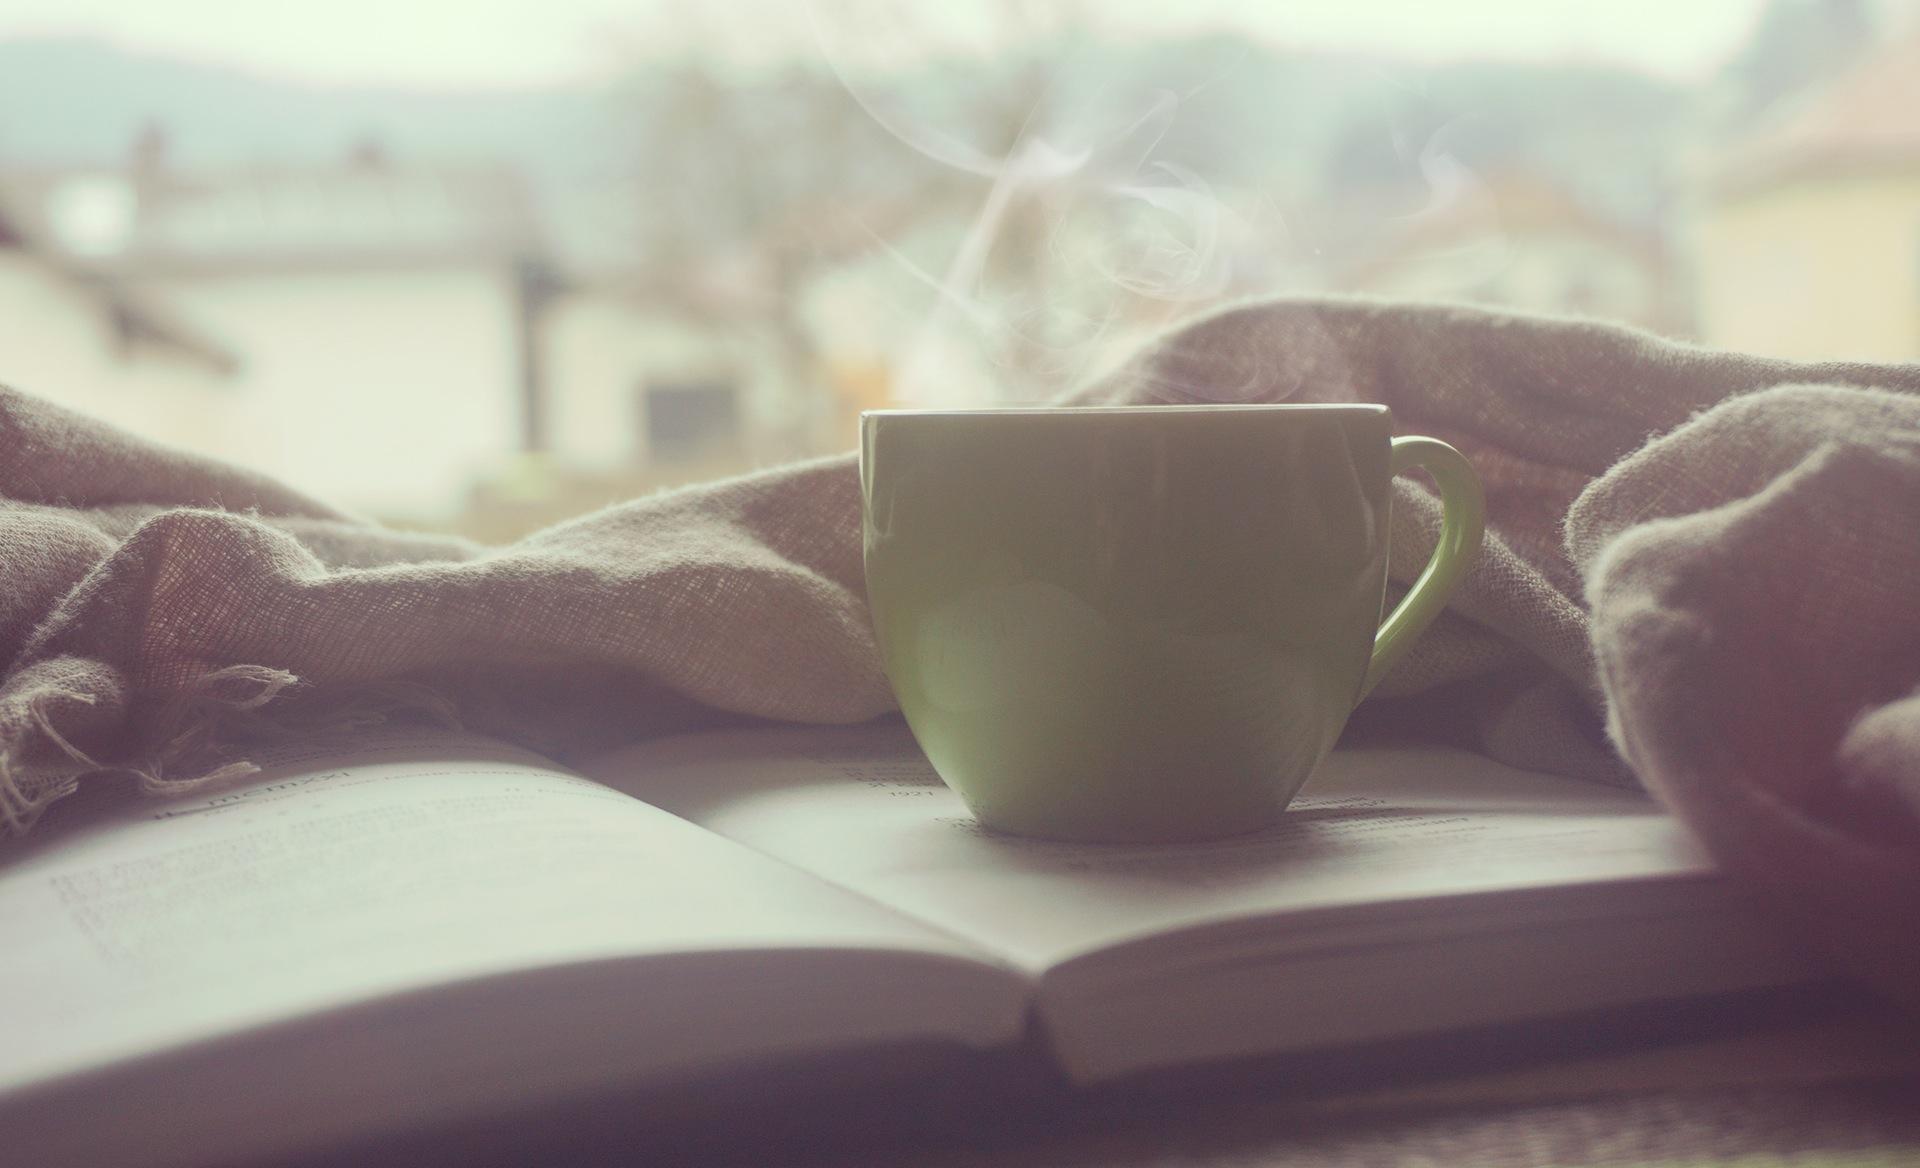 Kaffee, Tasse, Buch, Lesen, Ich bin Student, Tasse Kaffee - Wallpaper HD - Prof.-falken.com